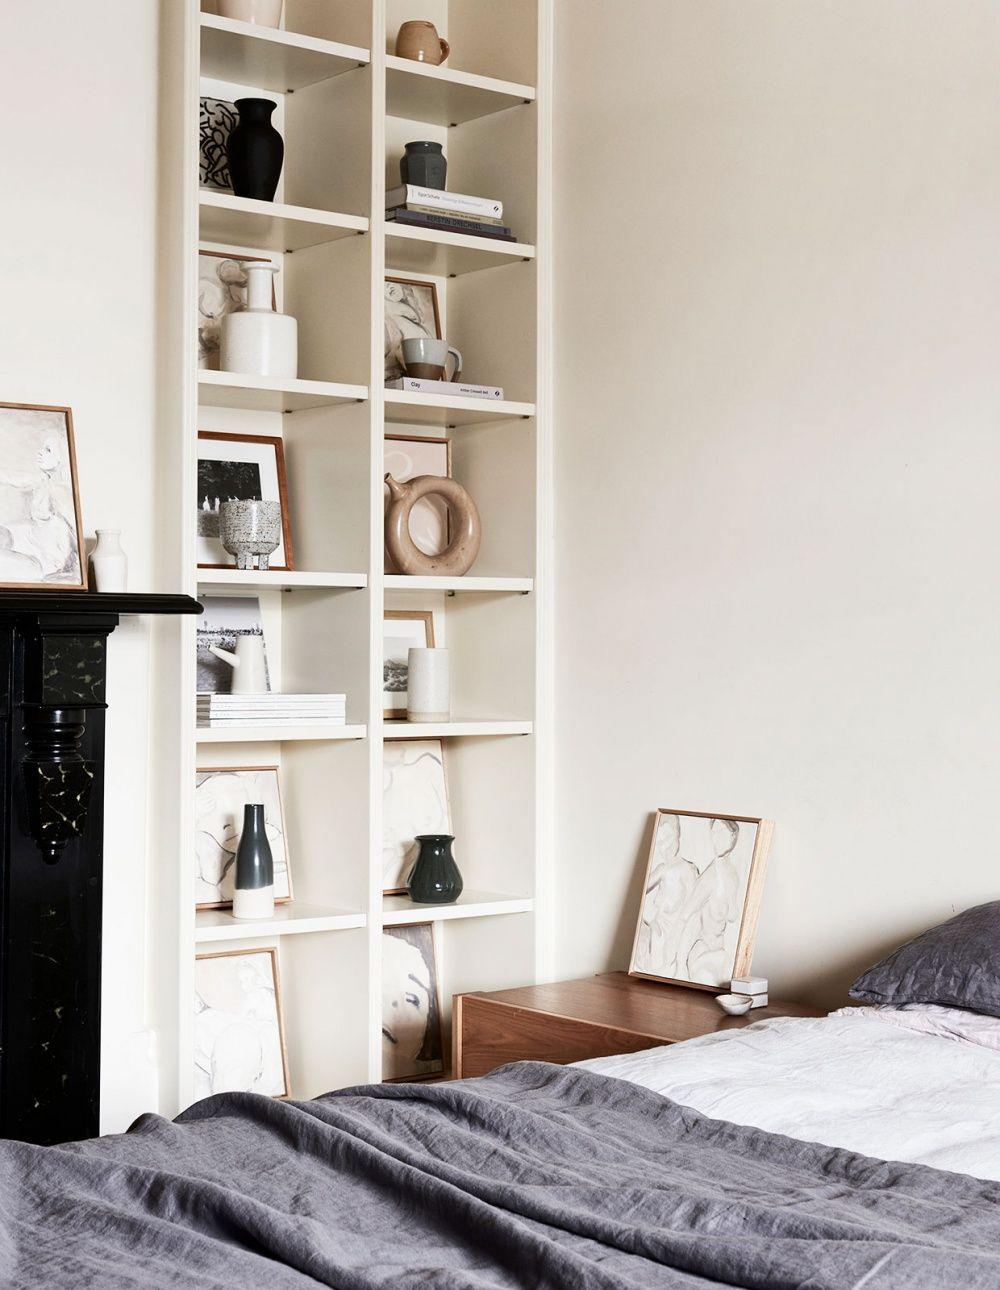 Design A Bedroom Online Best The Home Of Caroline Wallsphoto  Eve Wilsonproduction  Lucy Design Inspiration